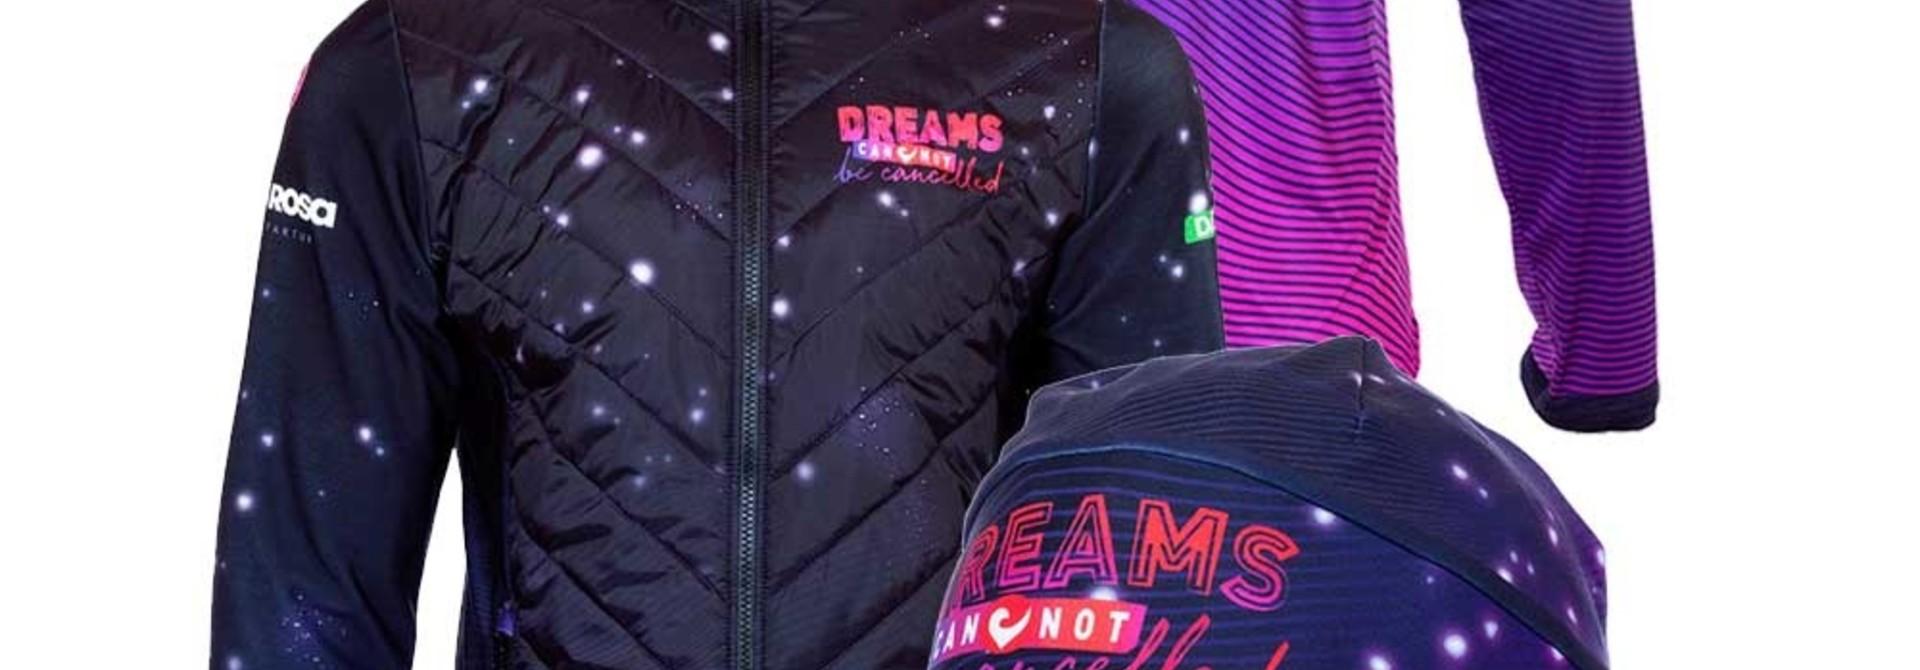 Dreaming of Winter Bundle